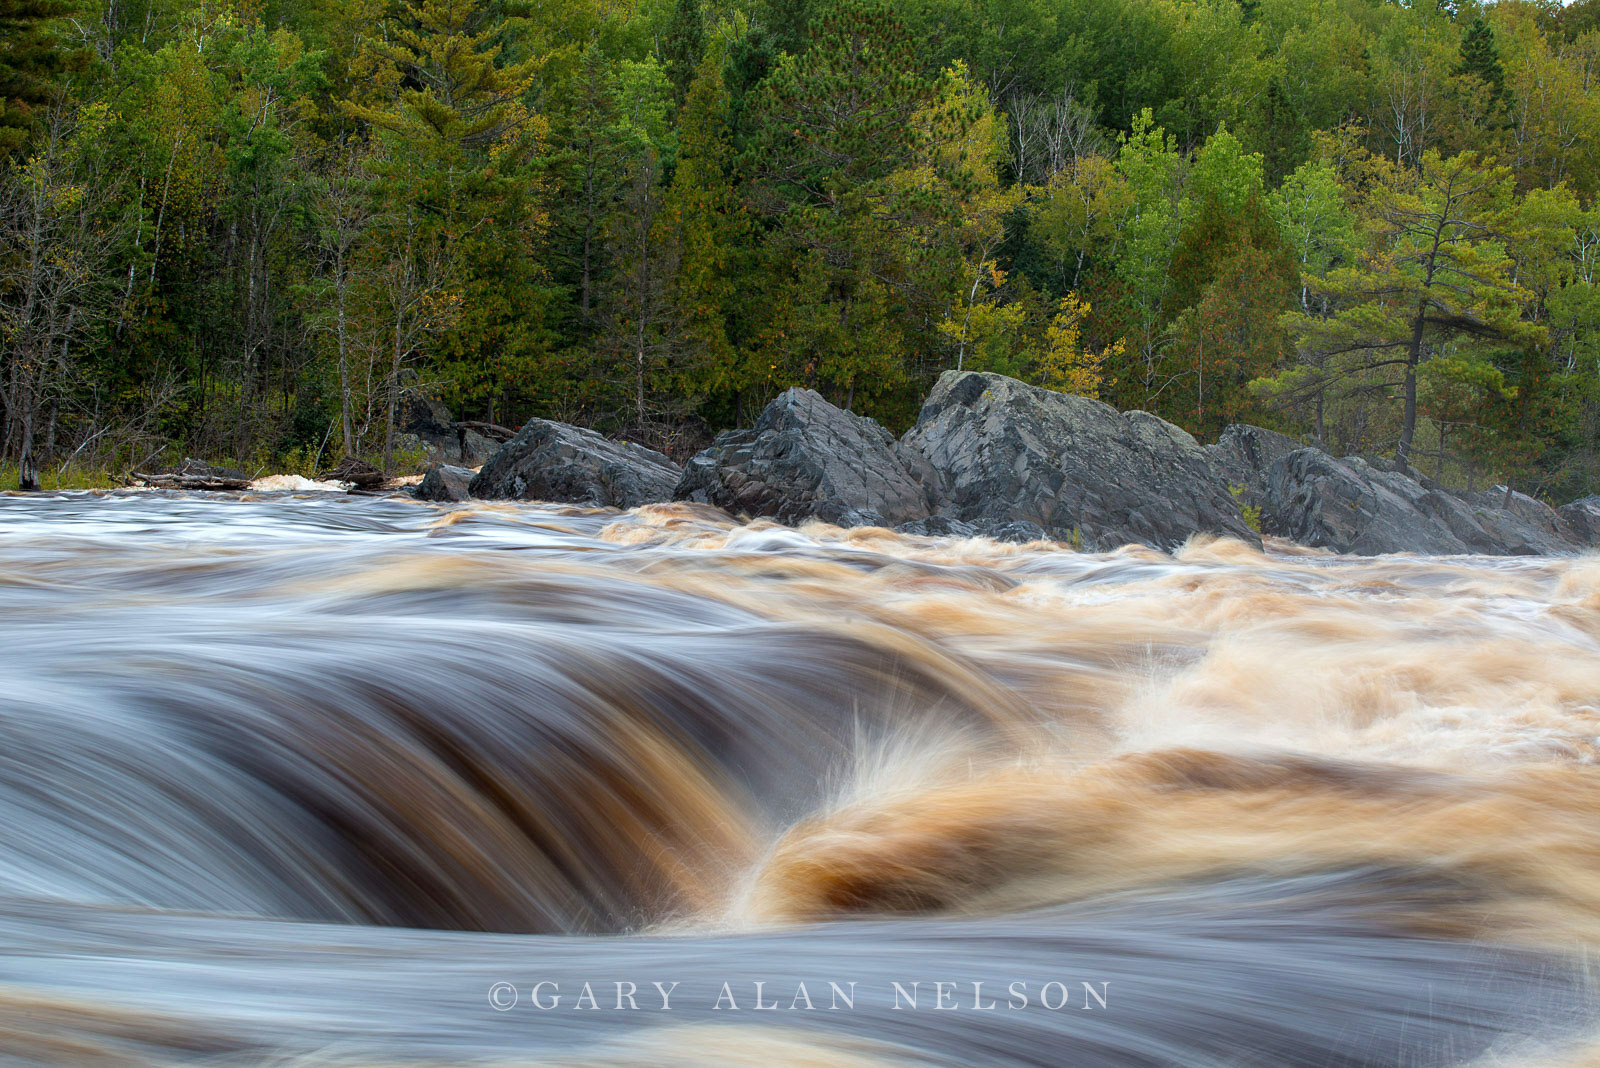 The roaring St. Louis River, J. Cooke State Park, Minnesota